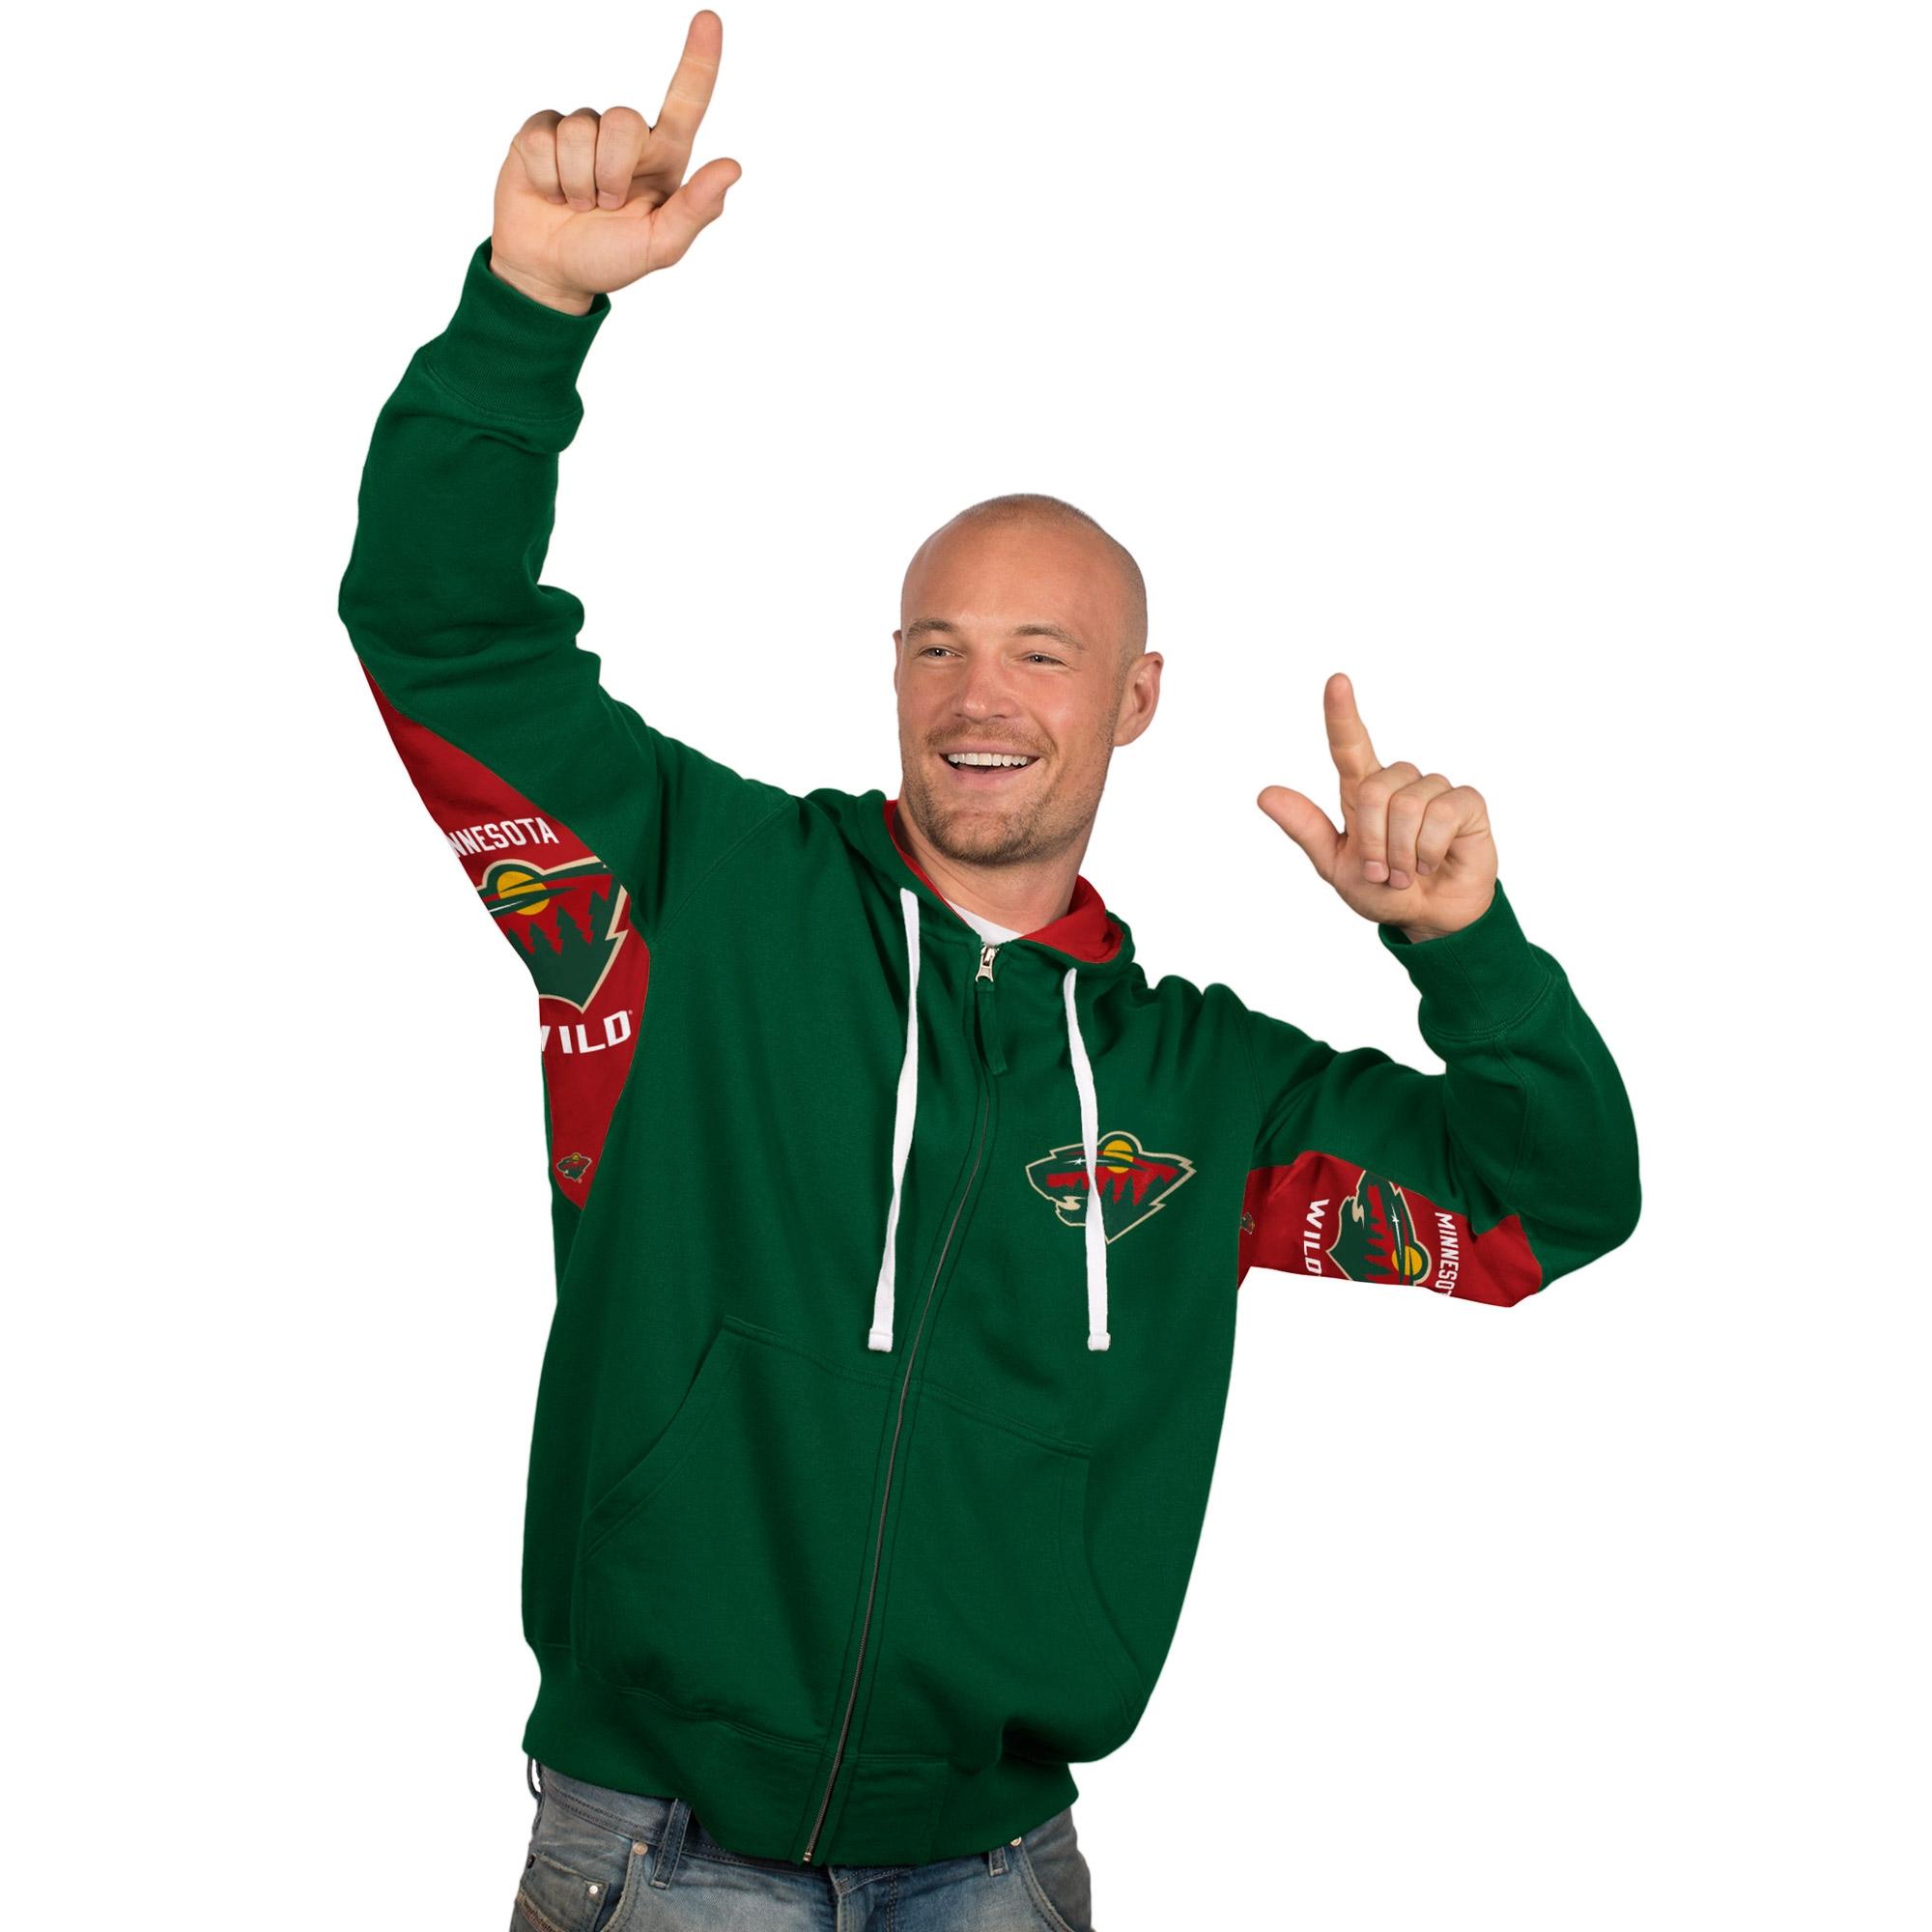 Minnesota Wild Hands High Full Zip Hoodie - Green